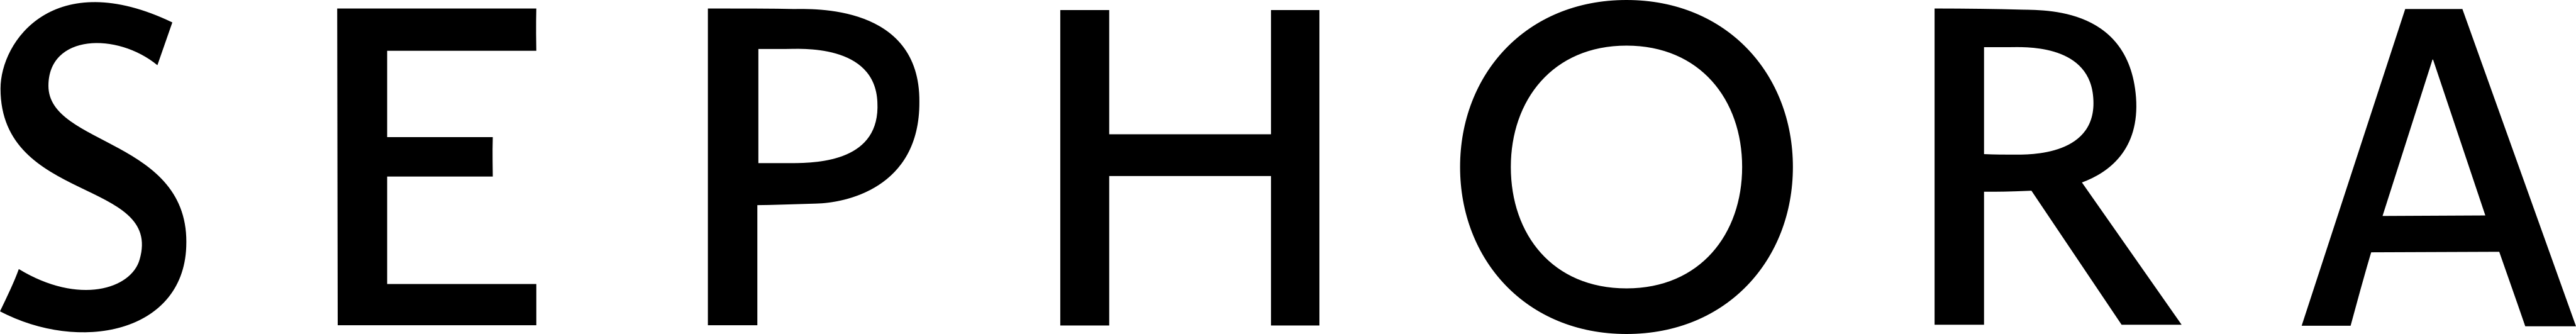 sephora logo - Sephora Logo